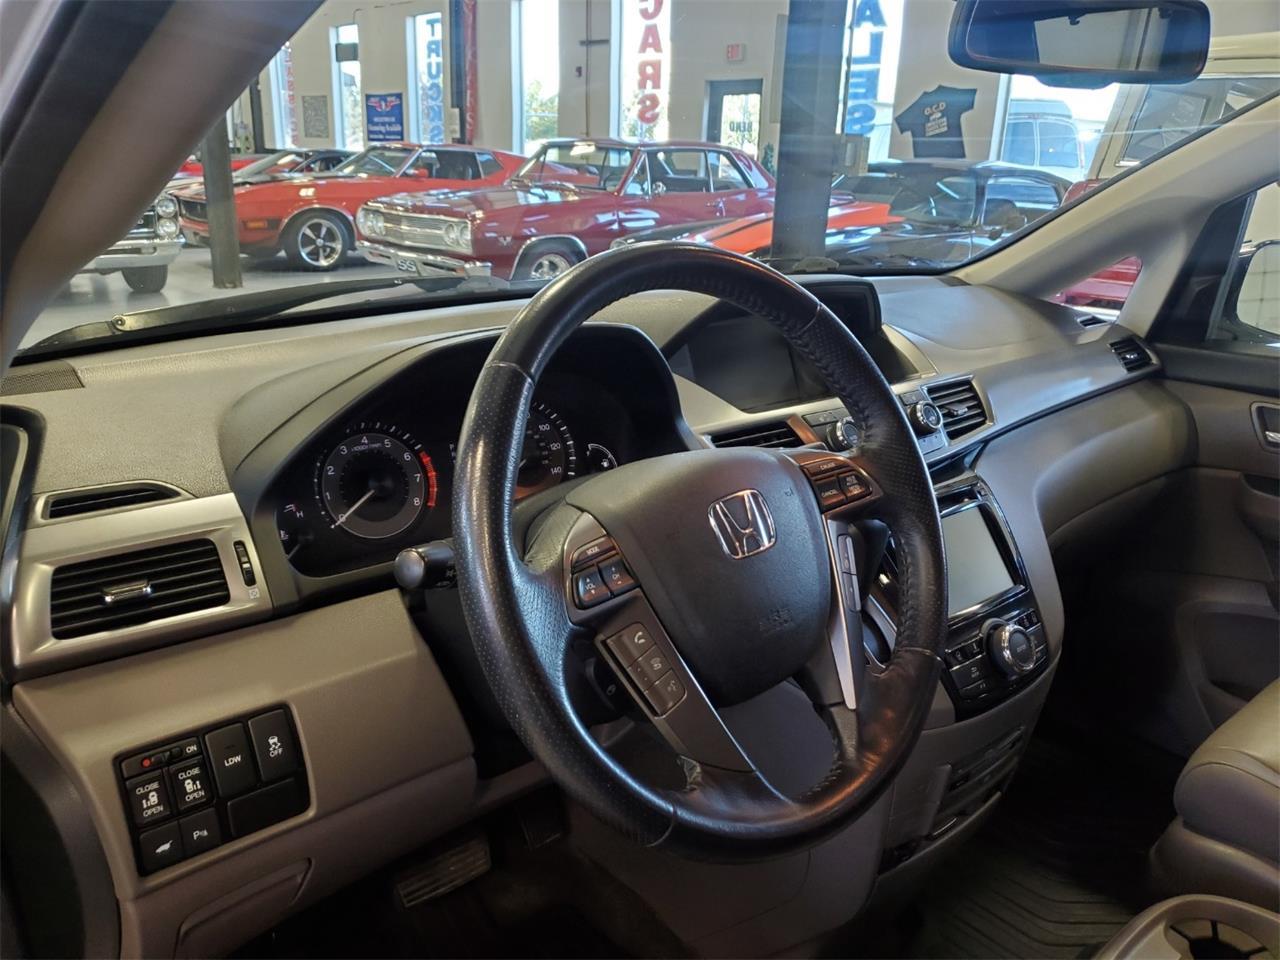 2014 Honda Odyssey (CC-1412283) for sale in Bend, Oregon